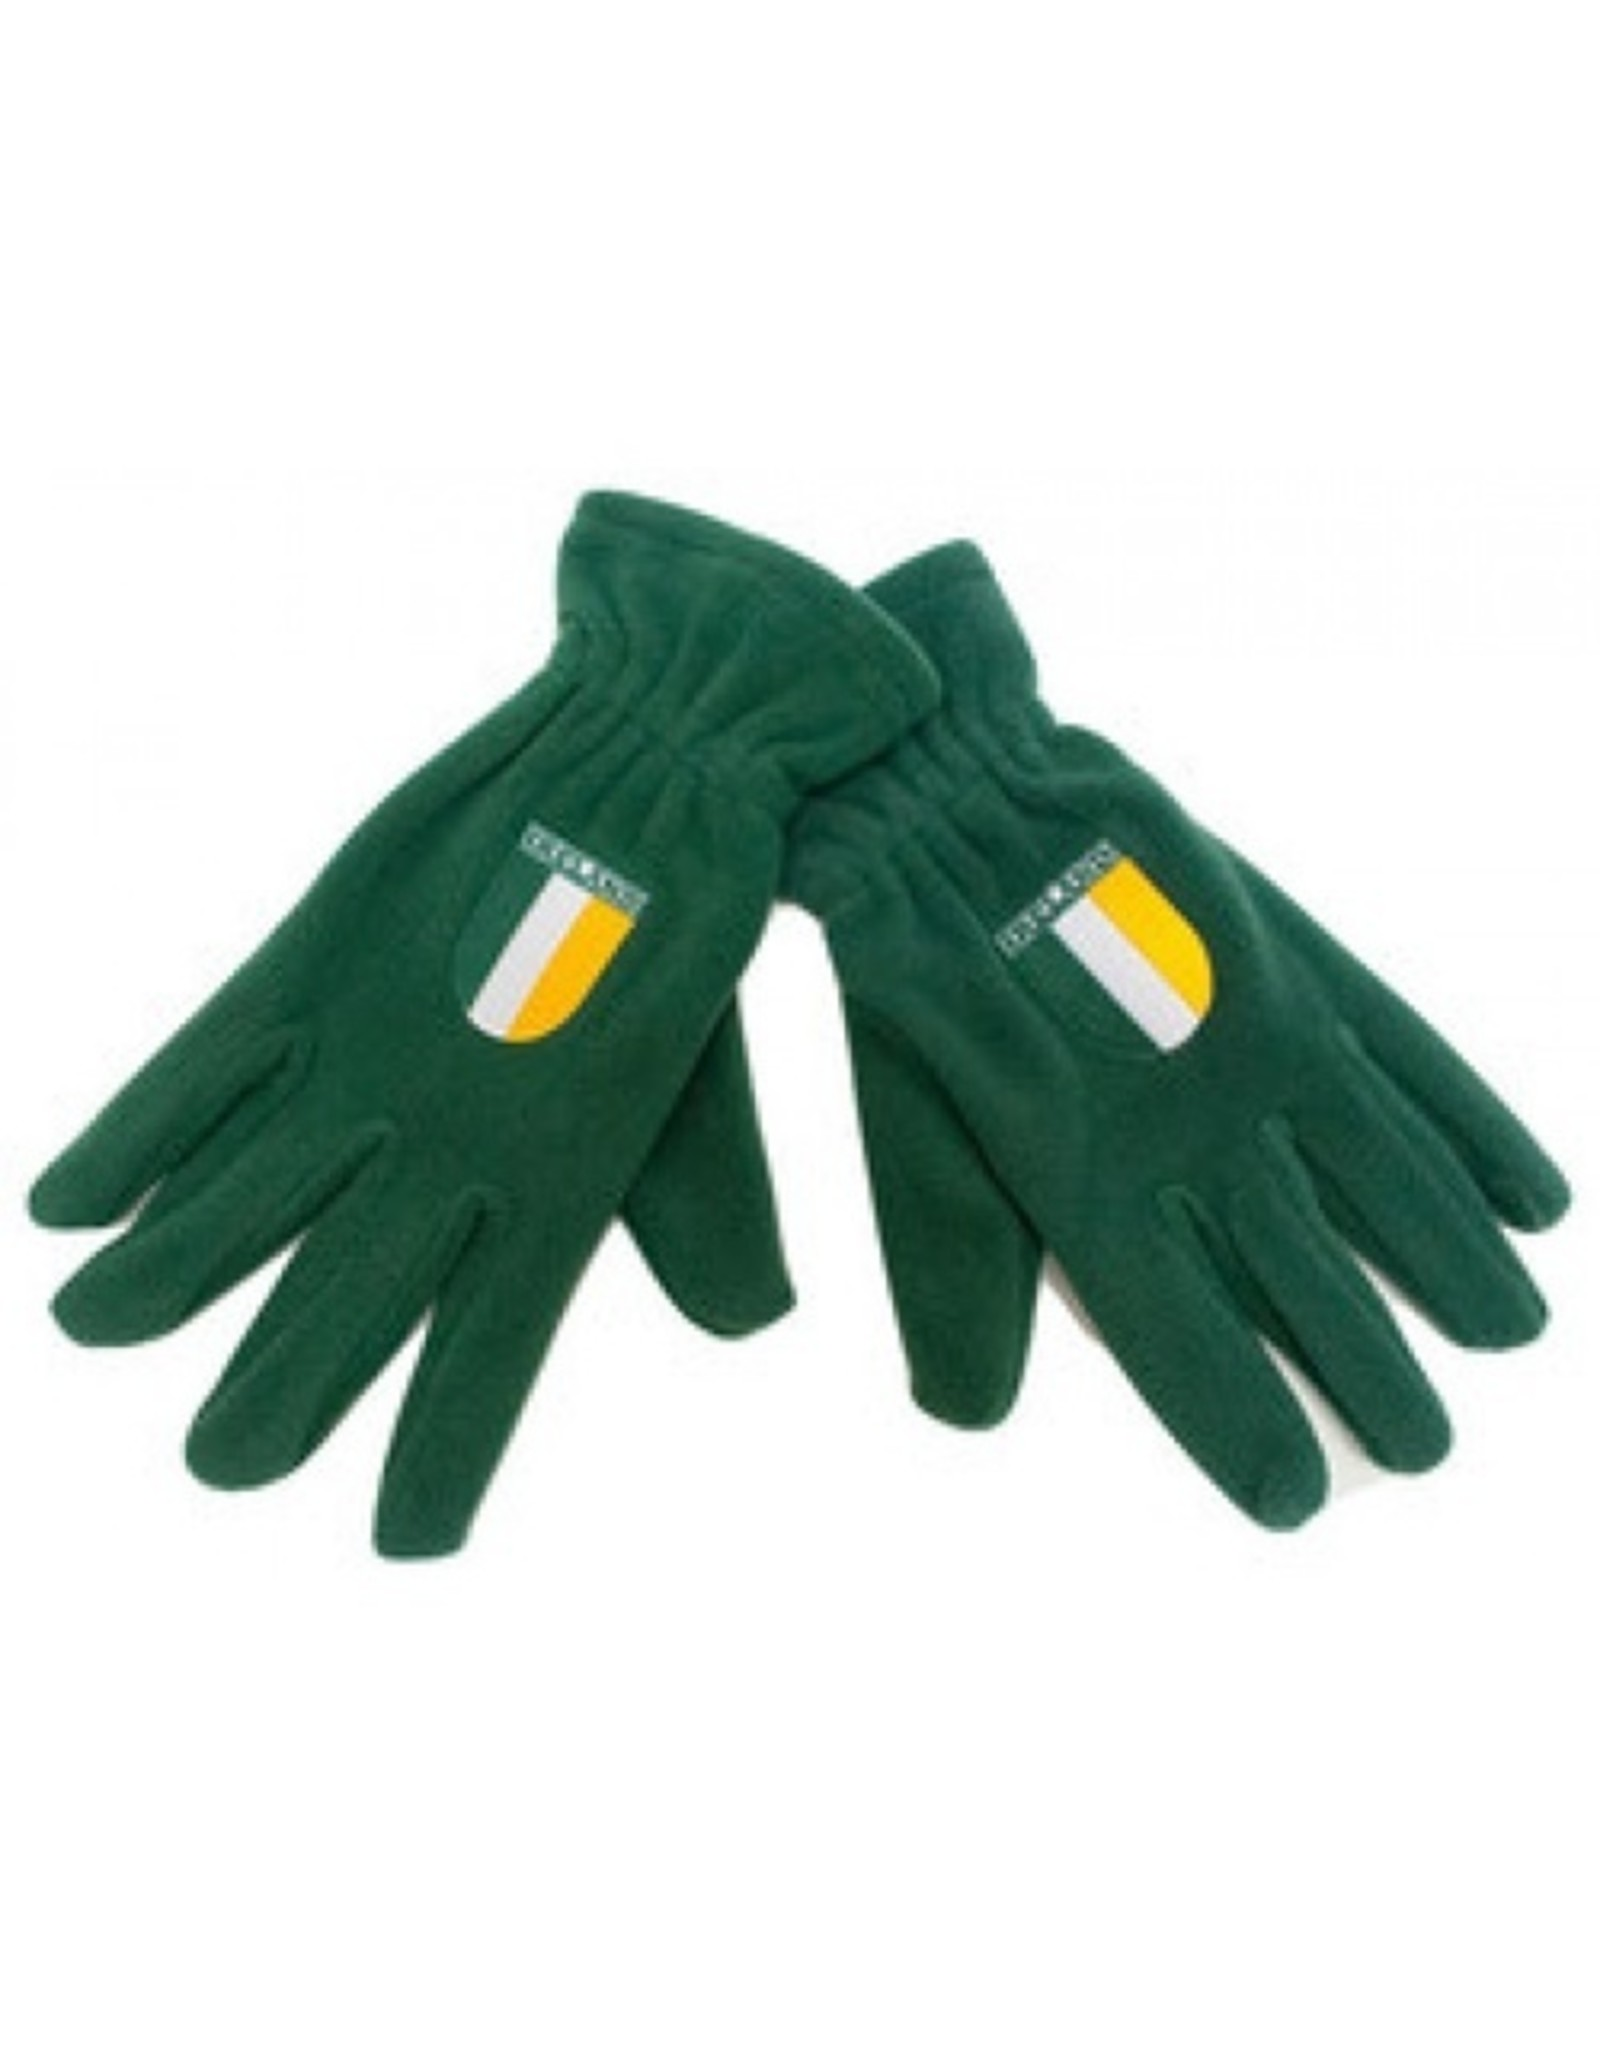 Donegal Bay Irish Gloves: Grn Fleece w/Flag